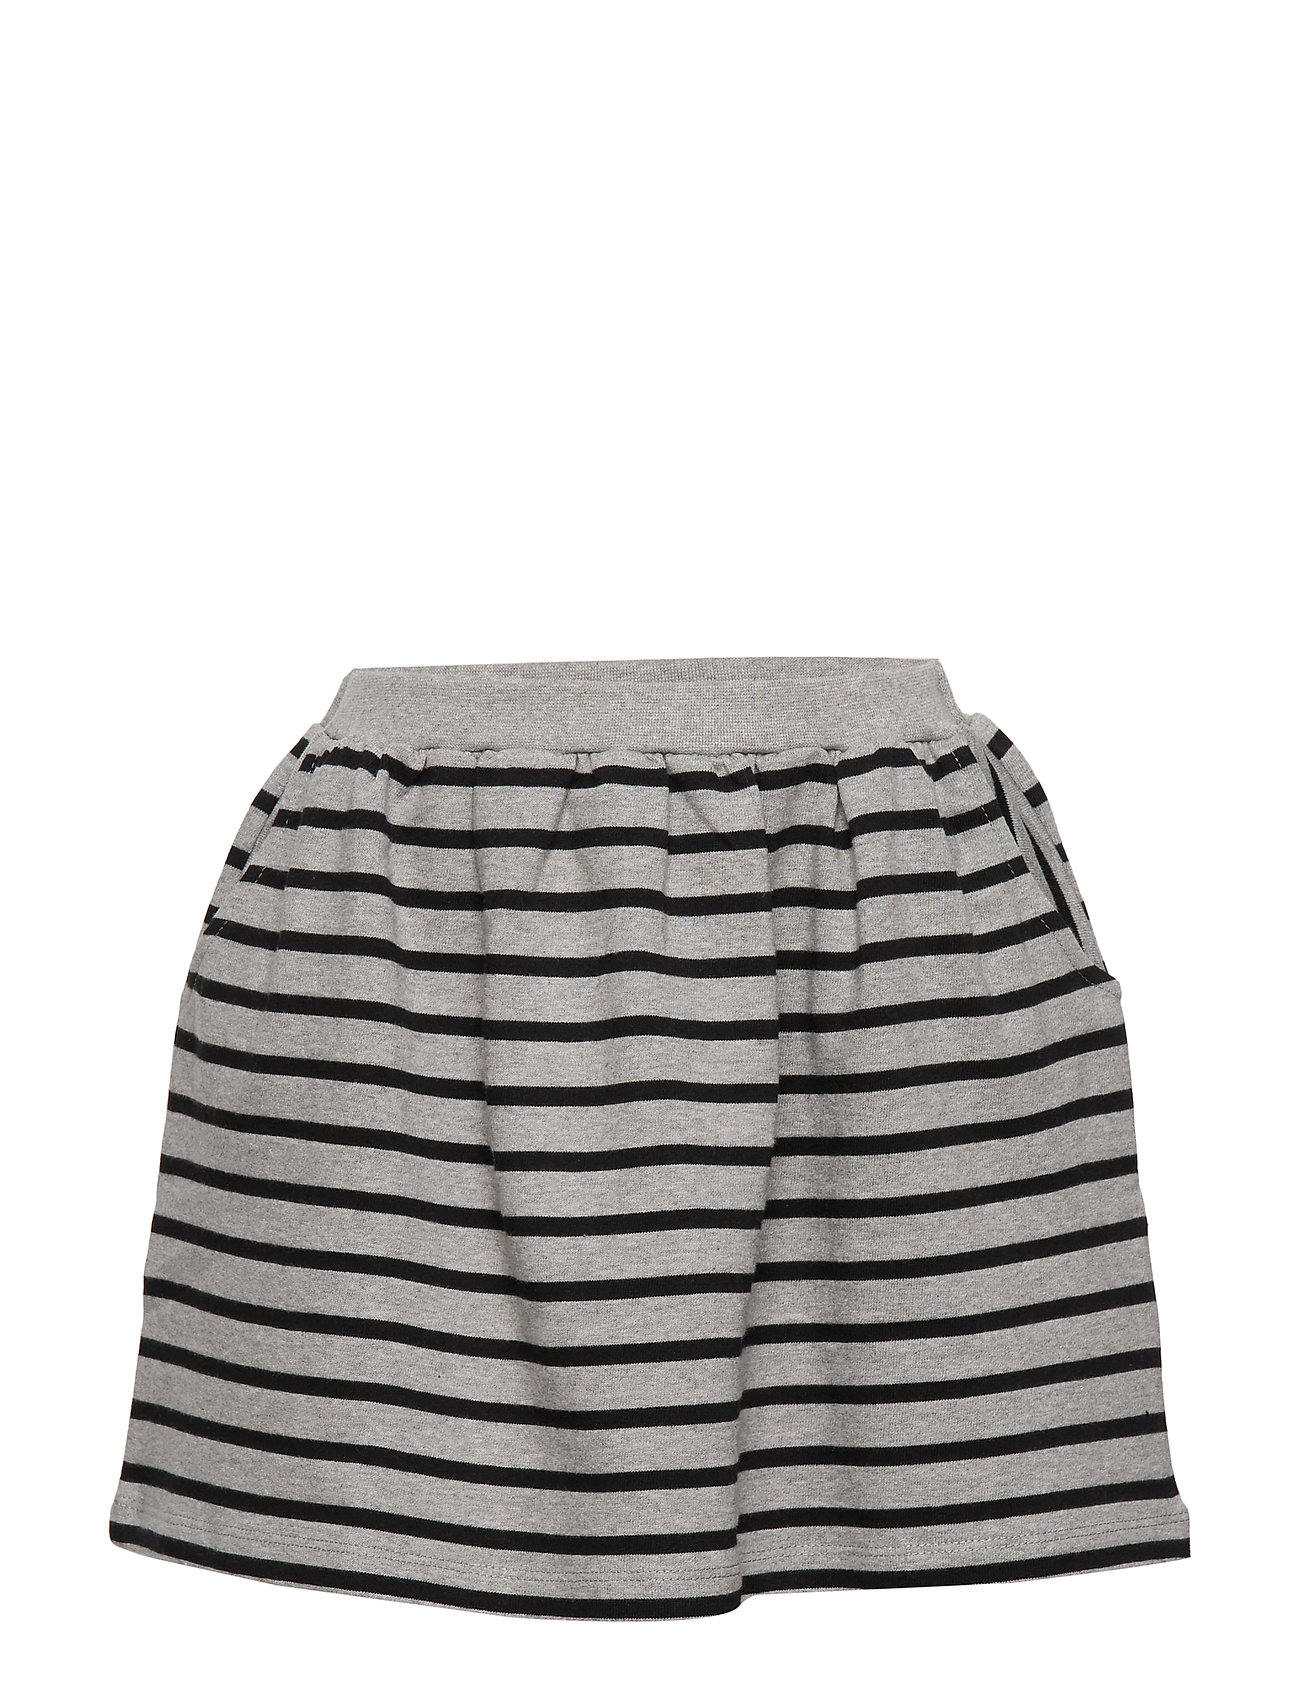 Noa Noa Miniature Skirt - GREY MELANGE